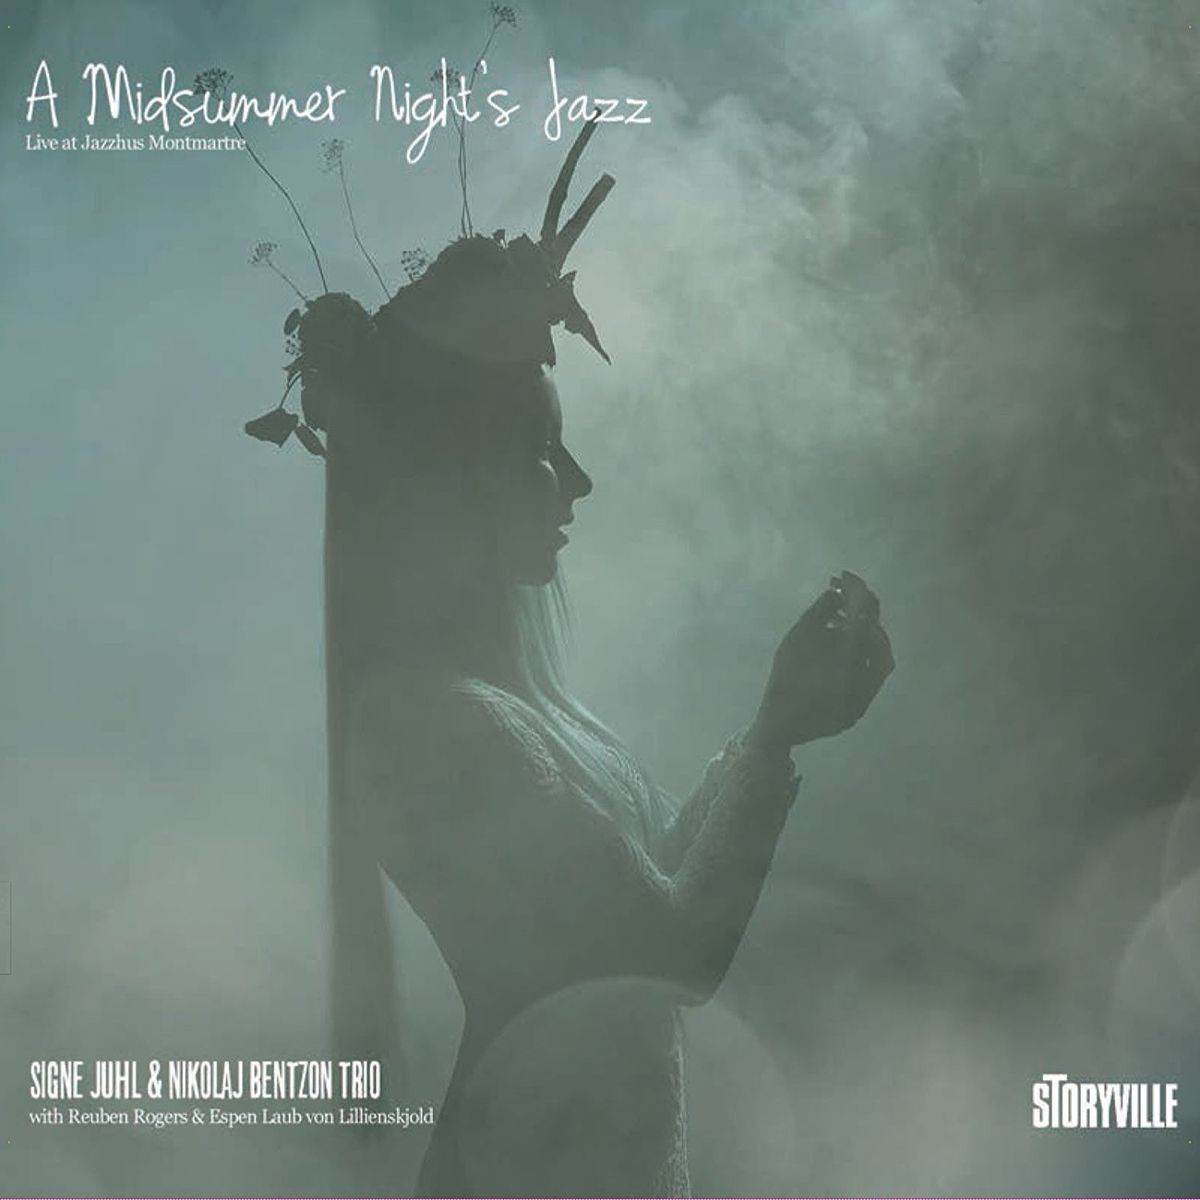 Signe Juhl & Nikolaj Bentzon Trio. A Midsummer Night's Jazz - Live at Jazzhus Montmar karin e juhl lost page 10